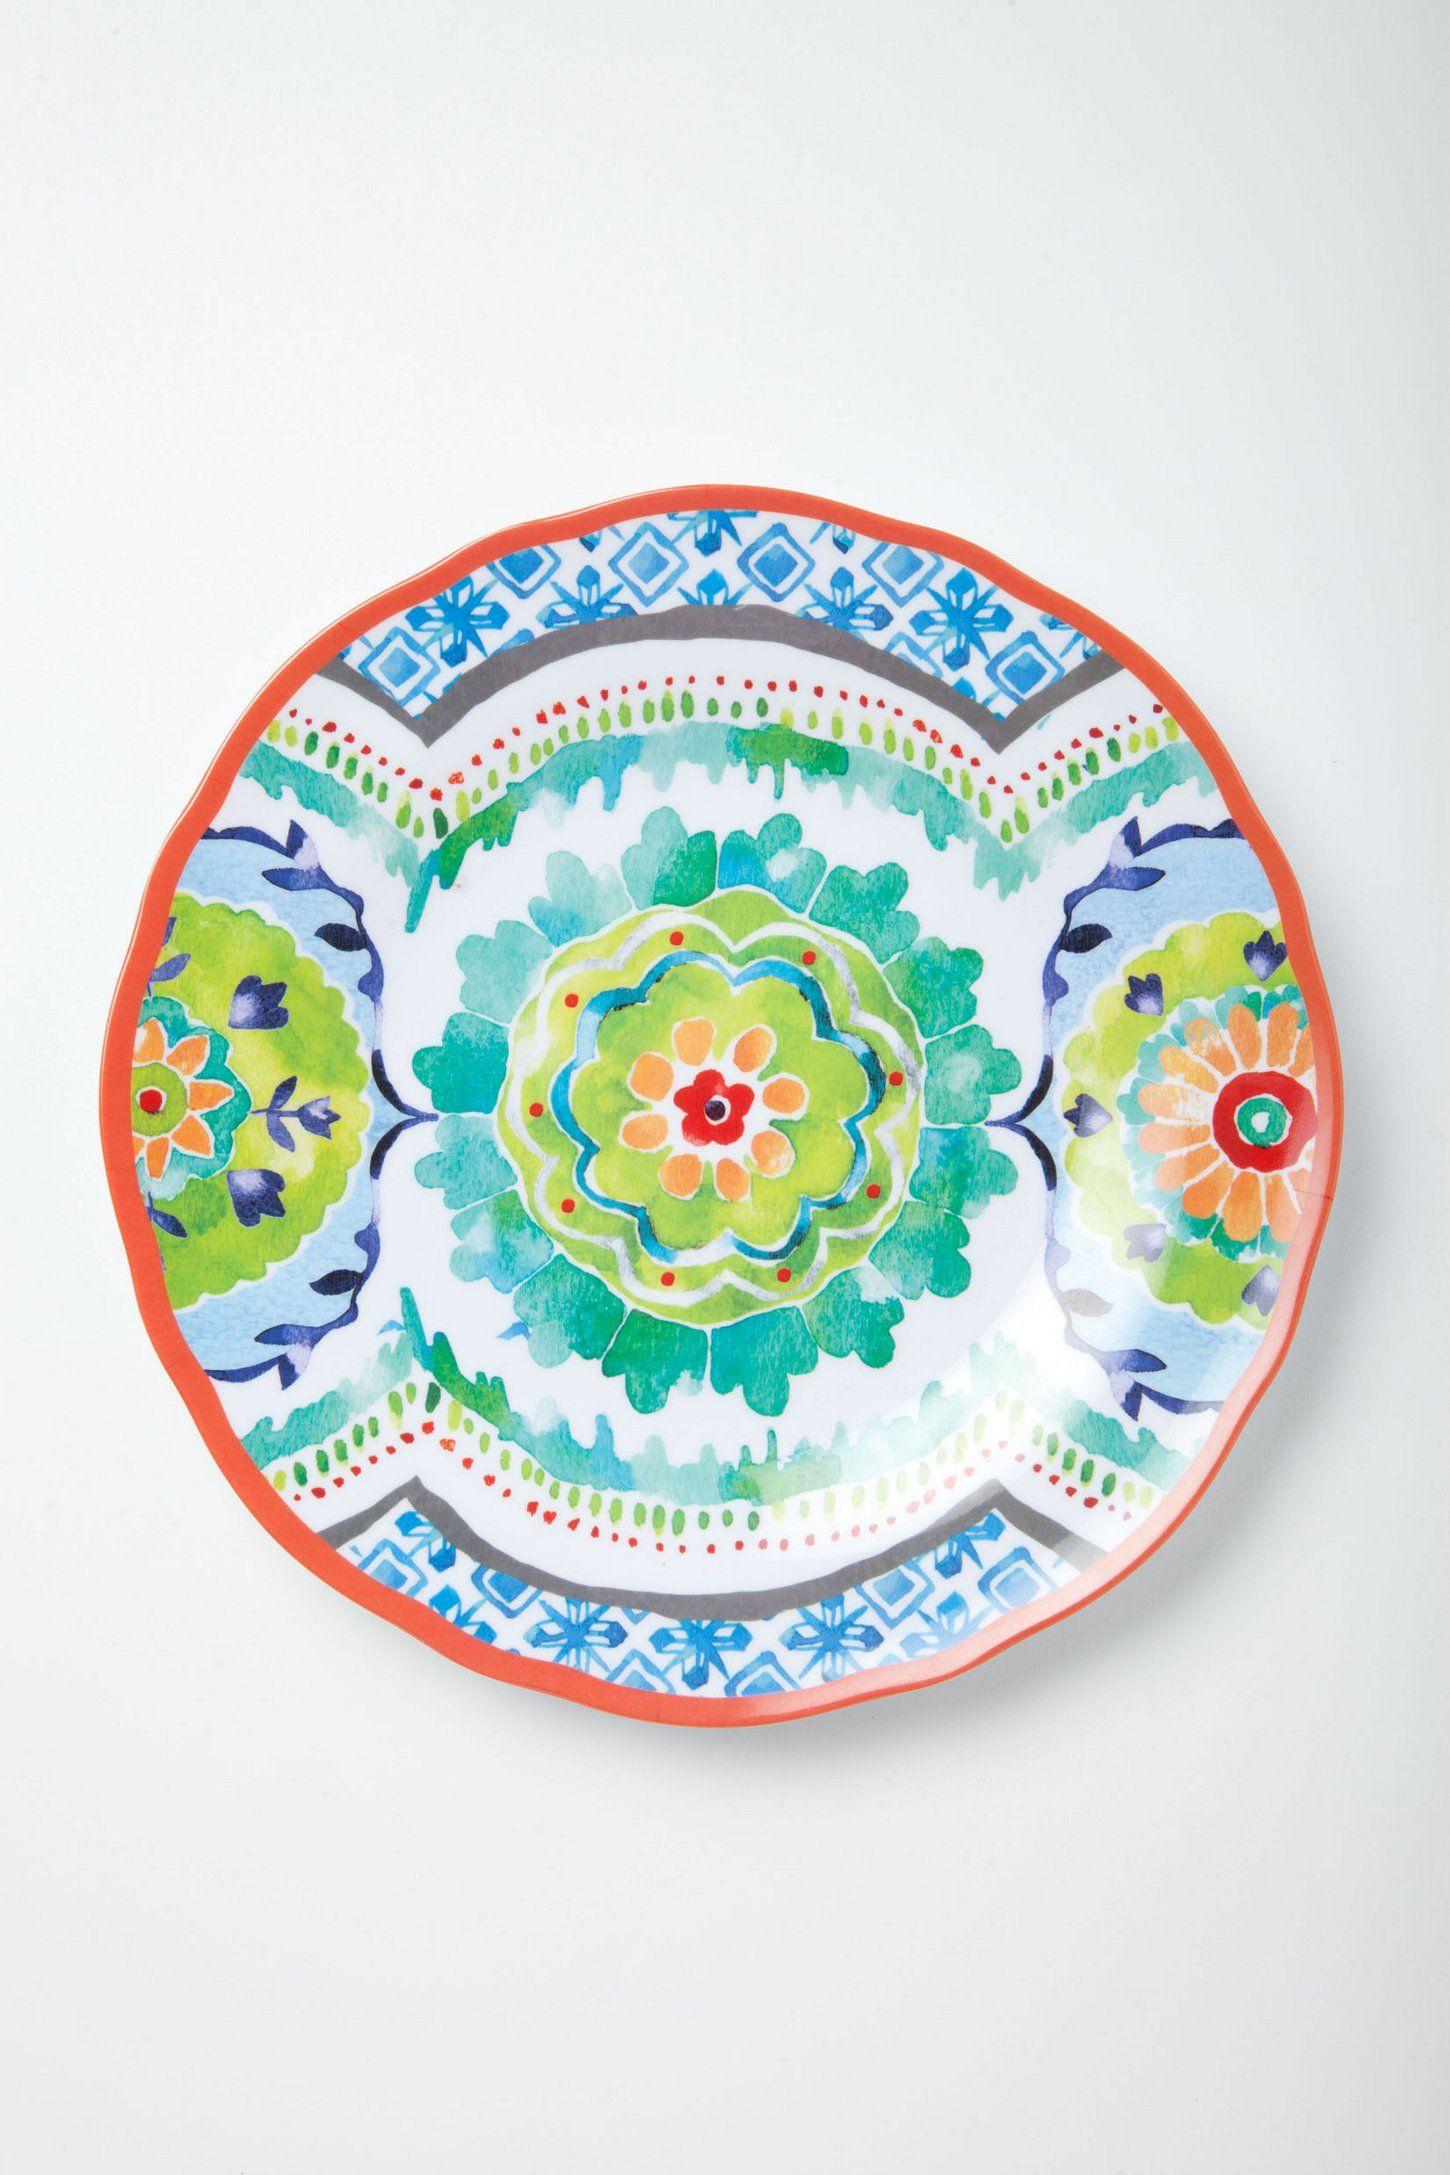 Ceramic plates · Hacienda Melamine Plate - Anthropologie.com  sc 1 st  Pinterest & Hacienda Melamine Plate - Anthropologie.com | global homewares ...